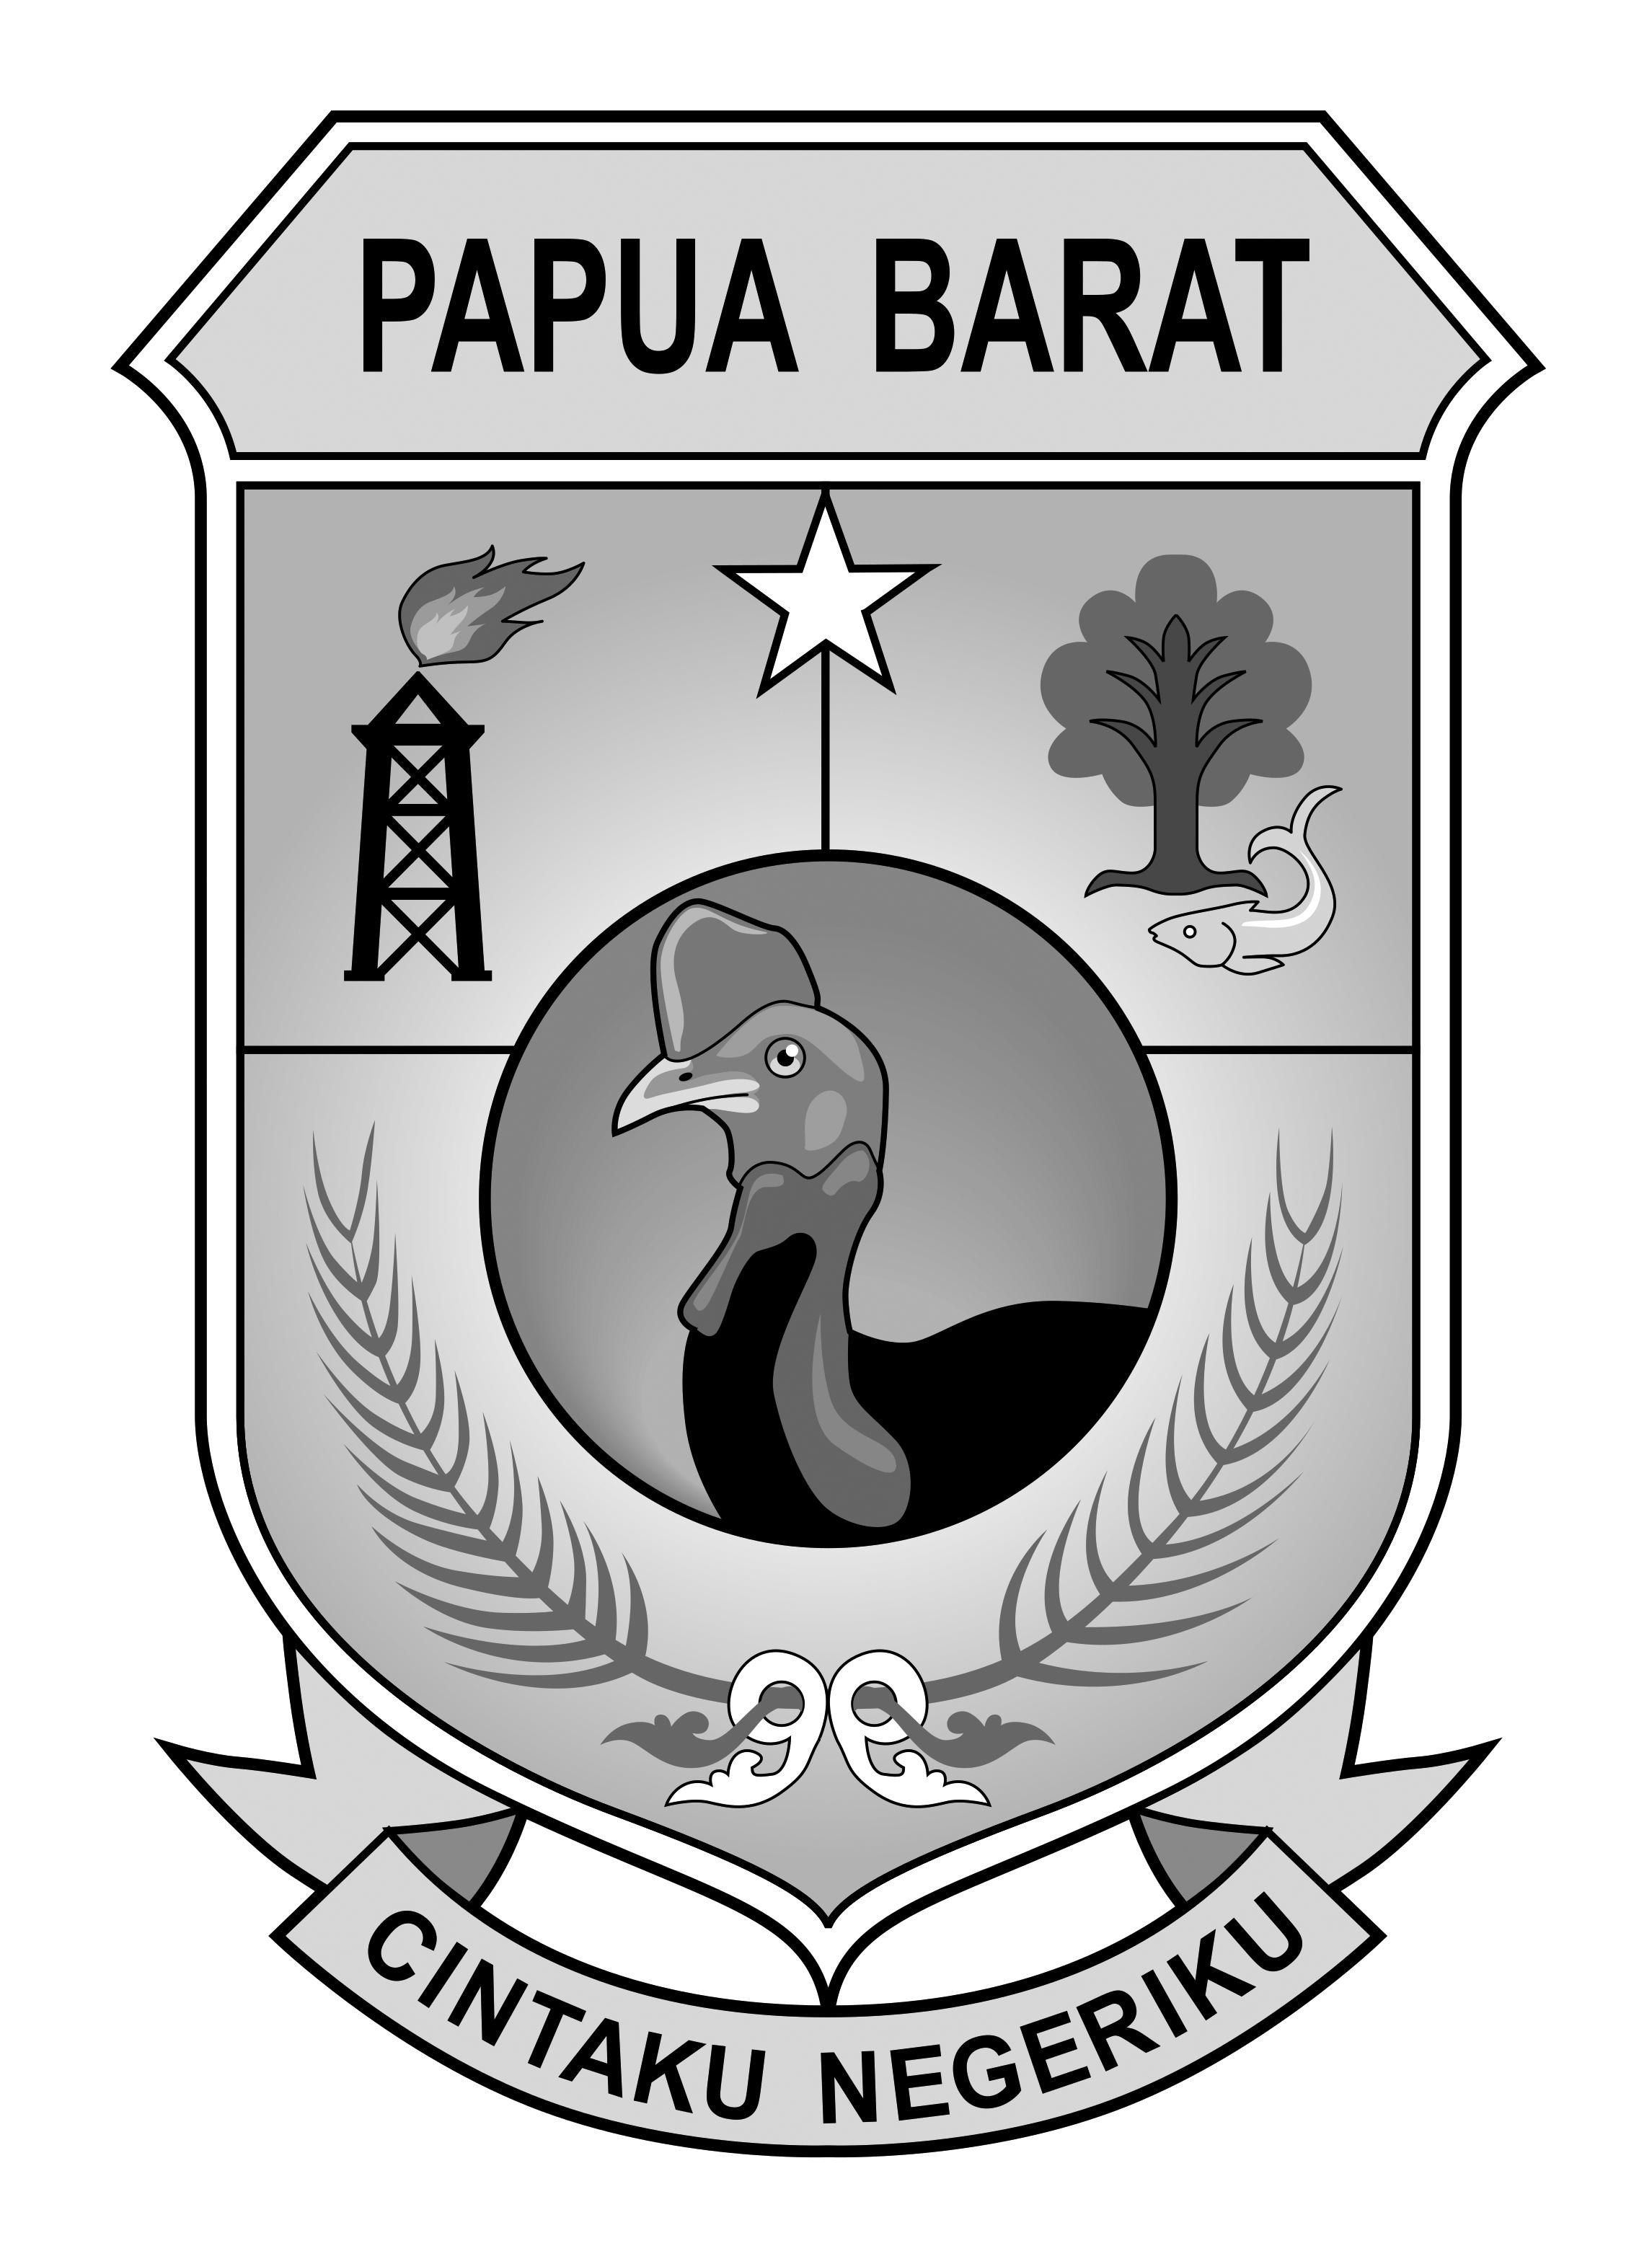 Logo Papua Barat (Papua Barat Indonesia) Original Grayscale